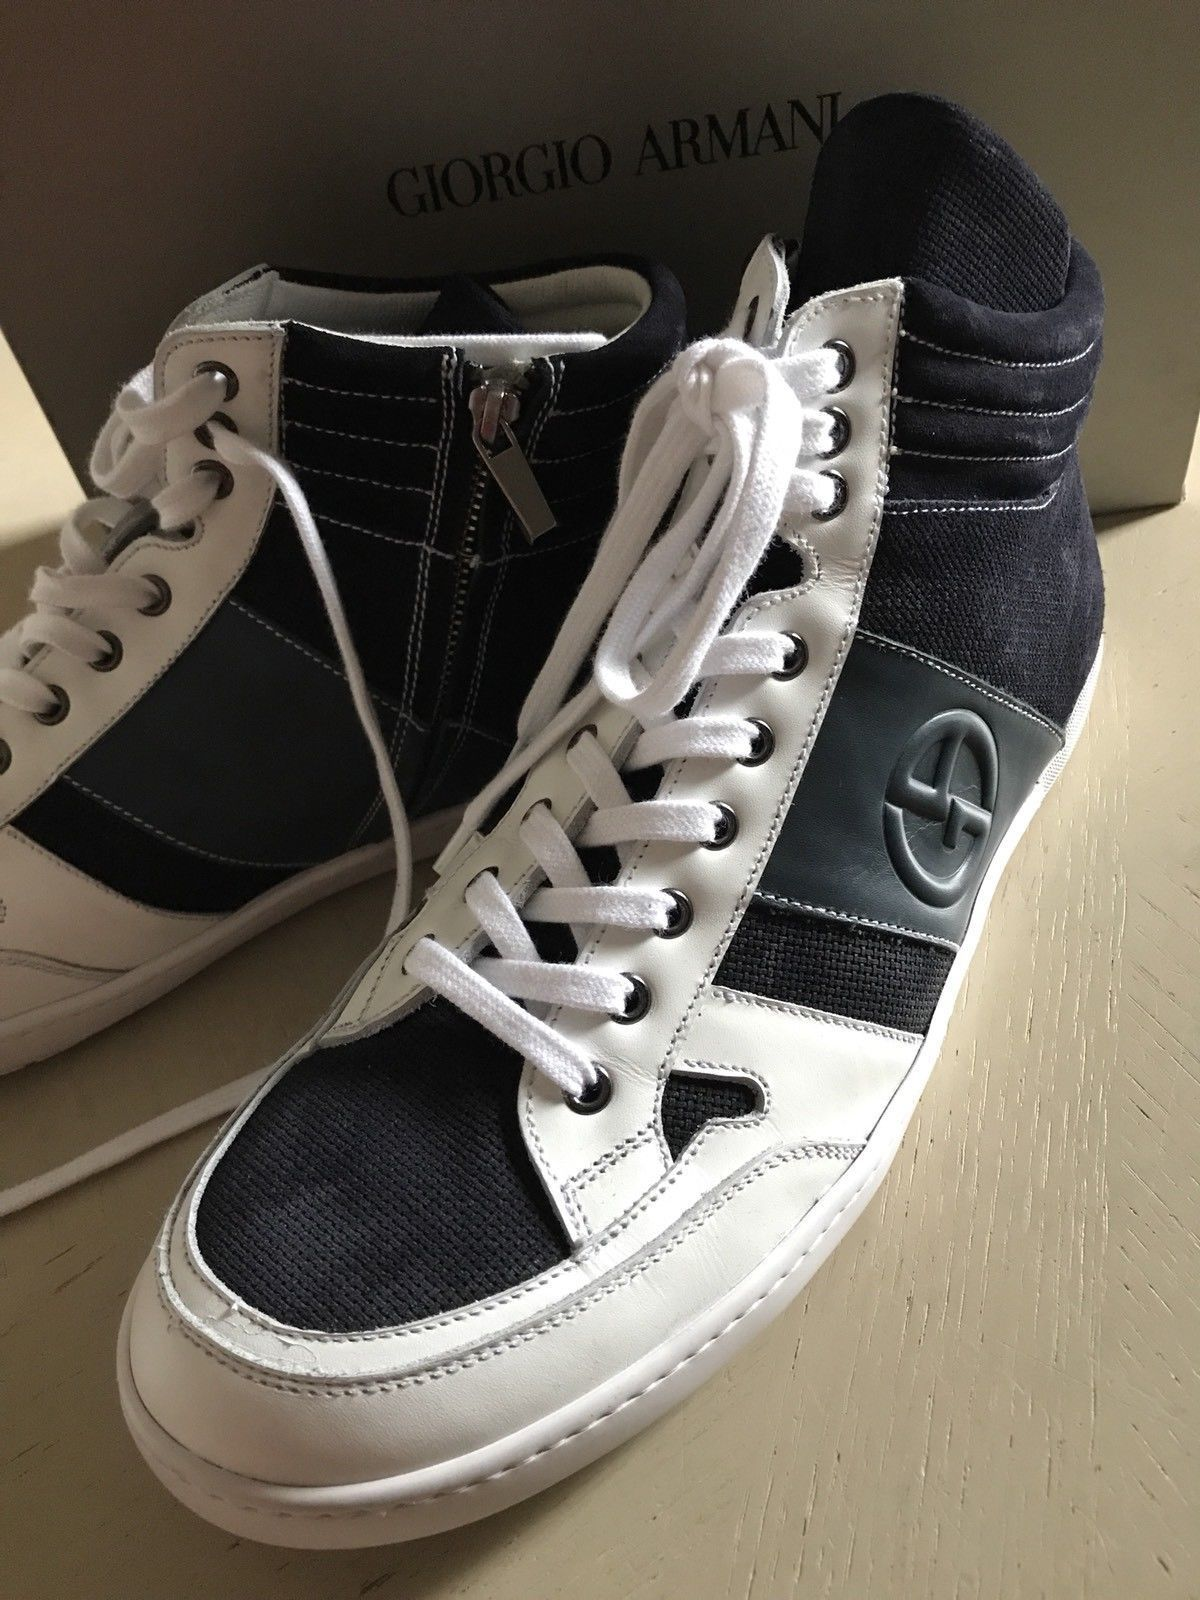 31ac6719 New $795 Giorgio Armani Mens Leather High Top Sneakers Black/White 12 US  X2Z005